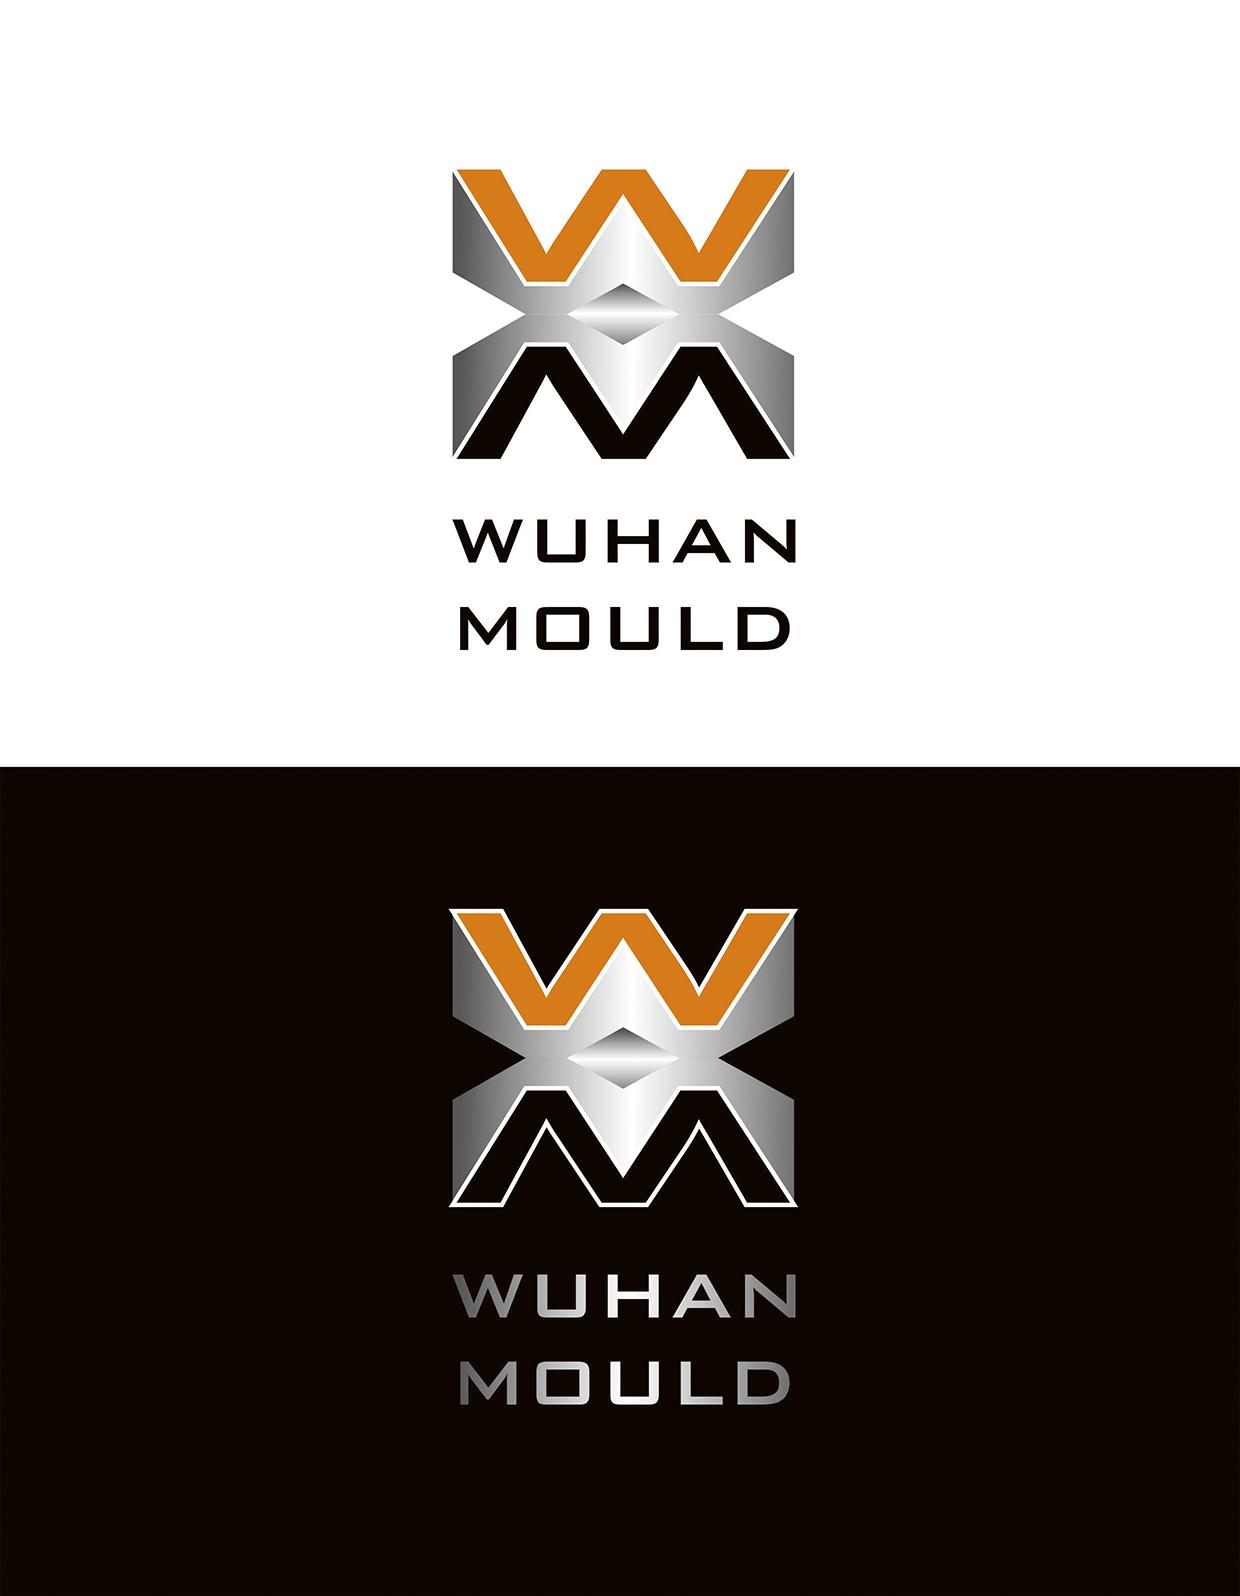 Создать логотип для фабрики пресс-форм фото f_13359909b7b2bde6.jpg